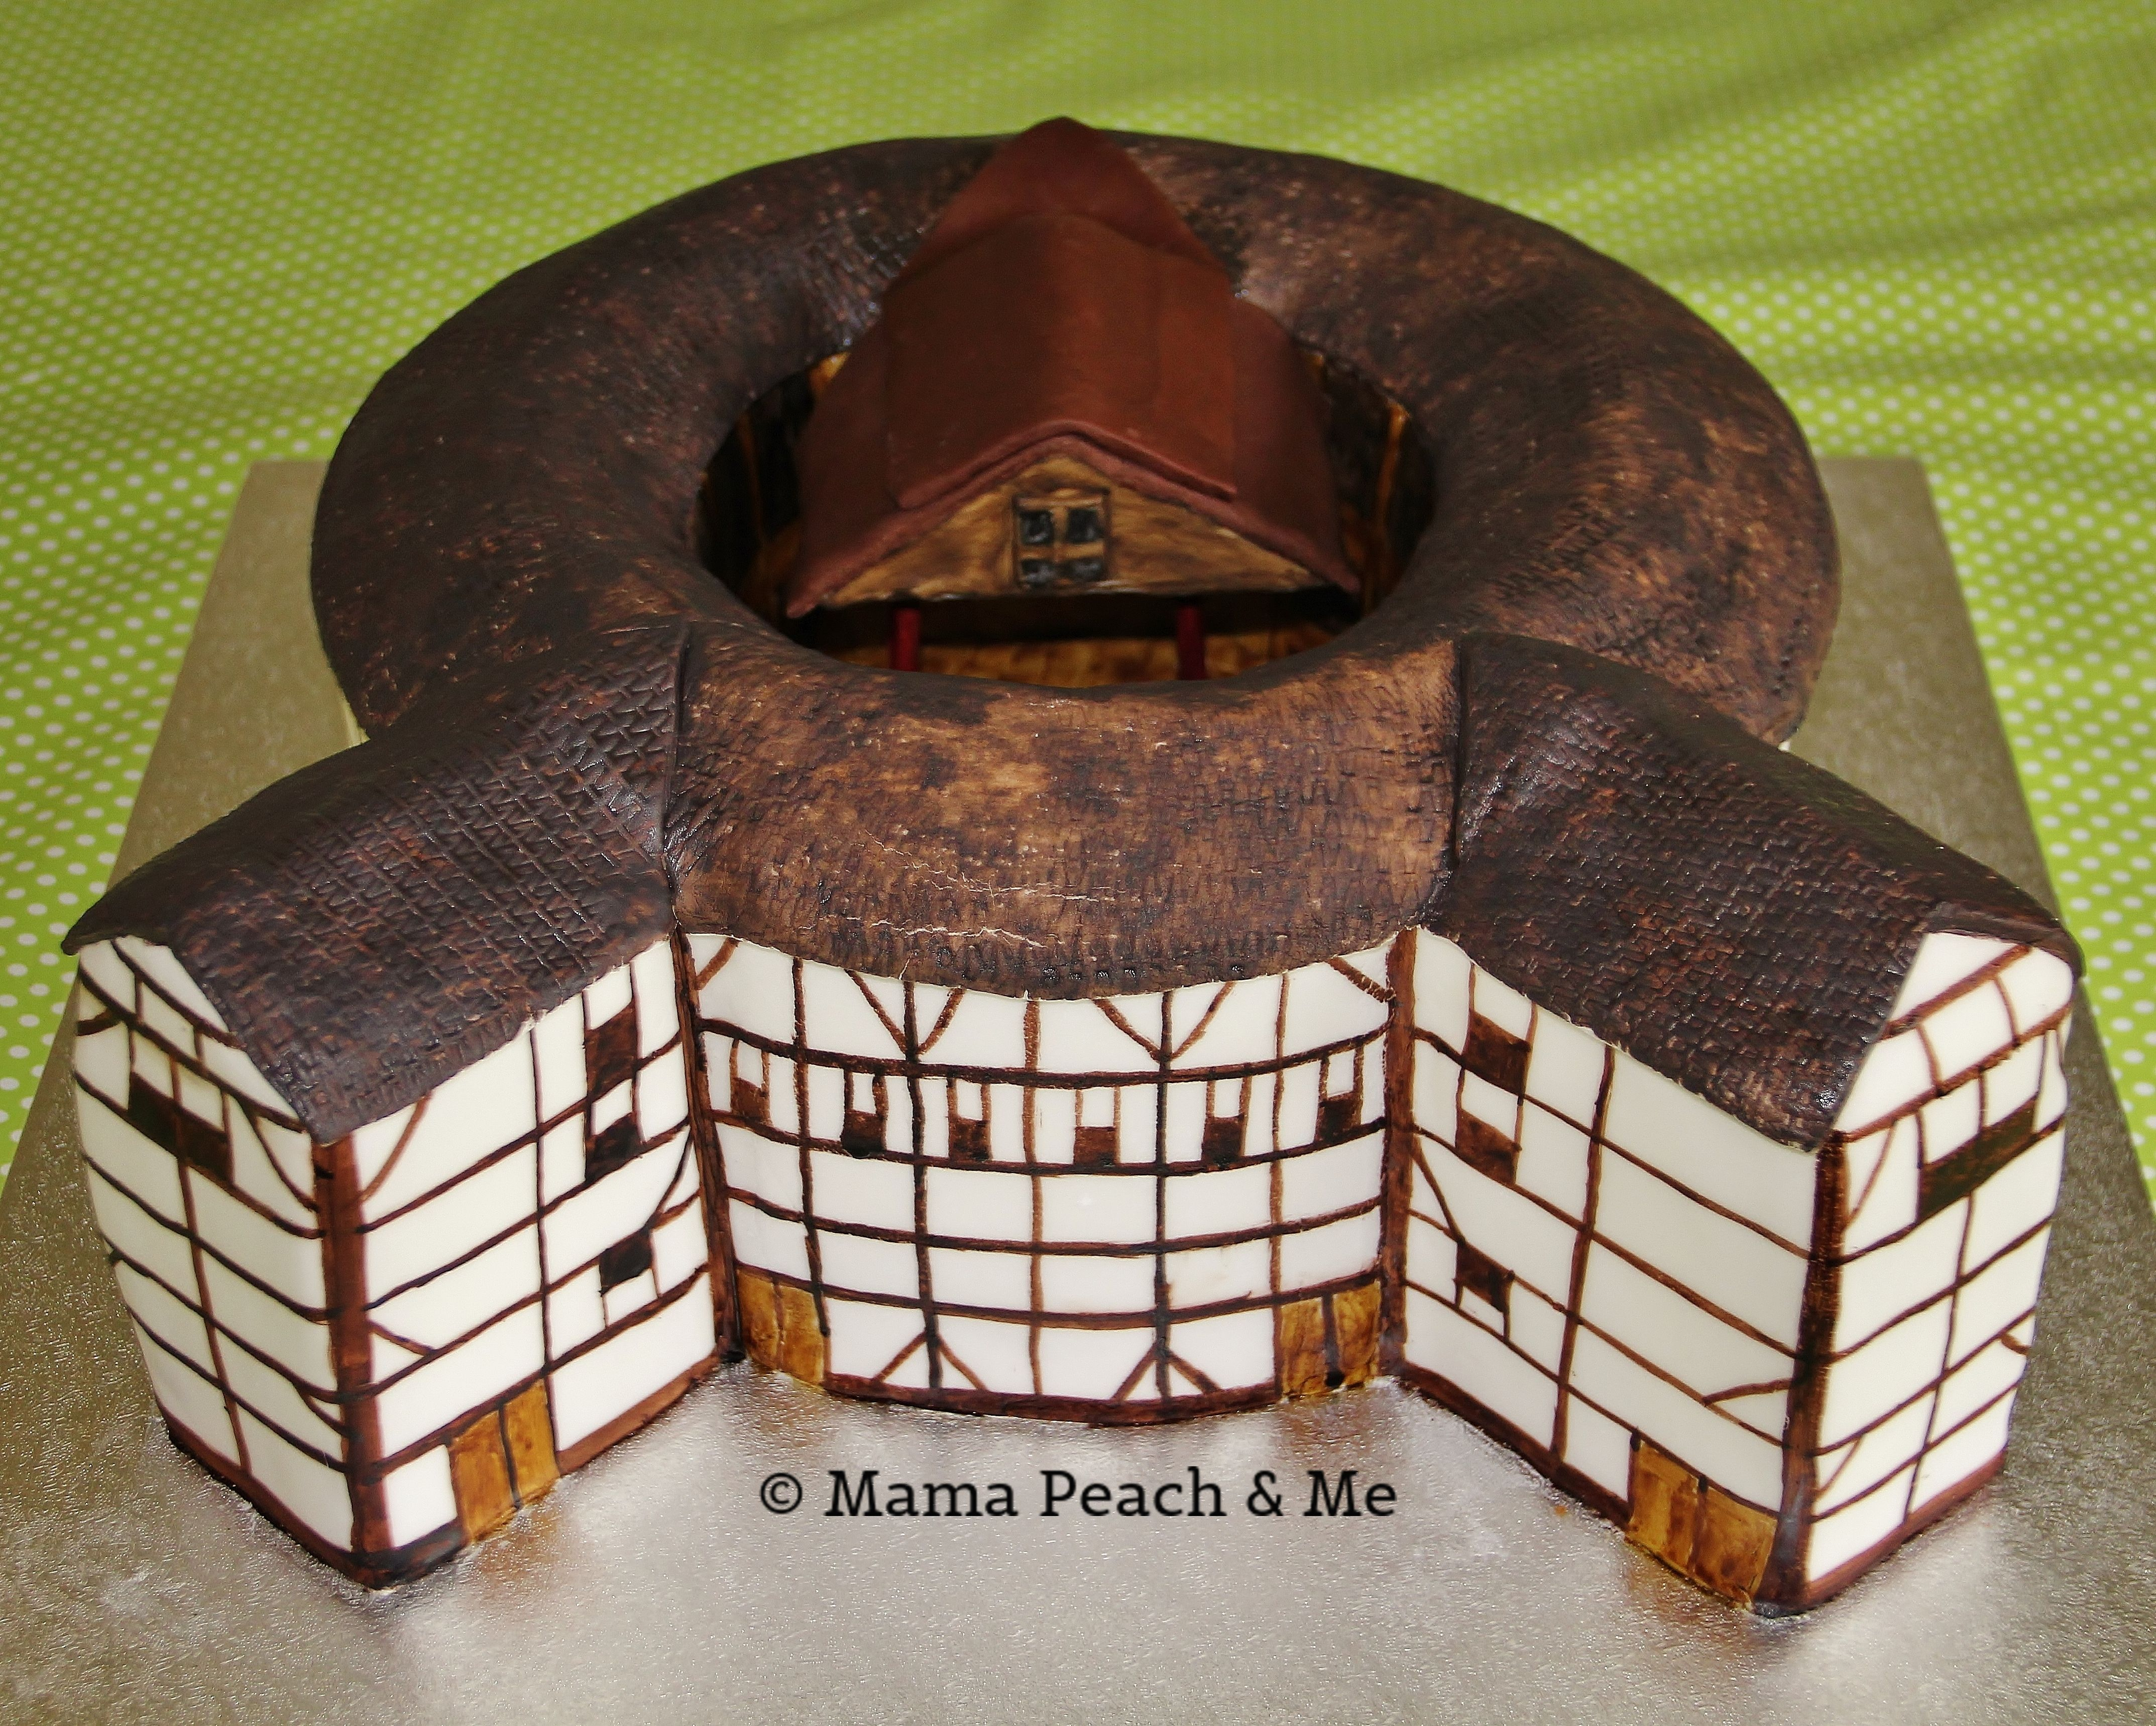 crumbs doilies shakespeare globe theatre cake cakes for bri s